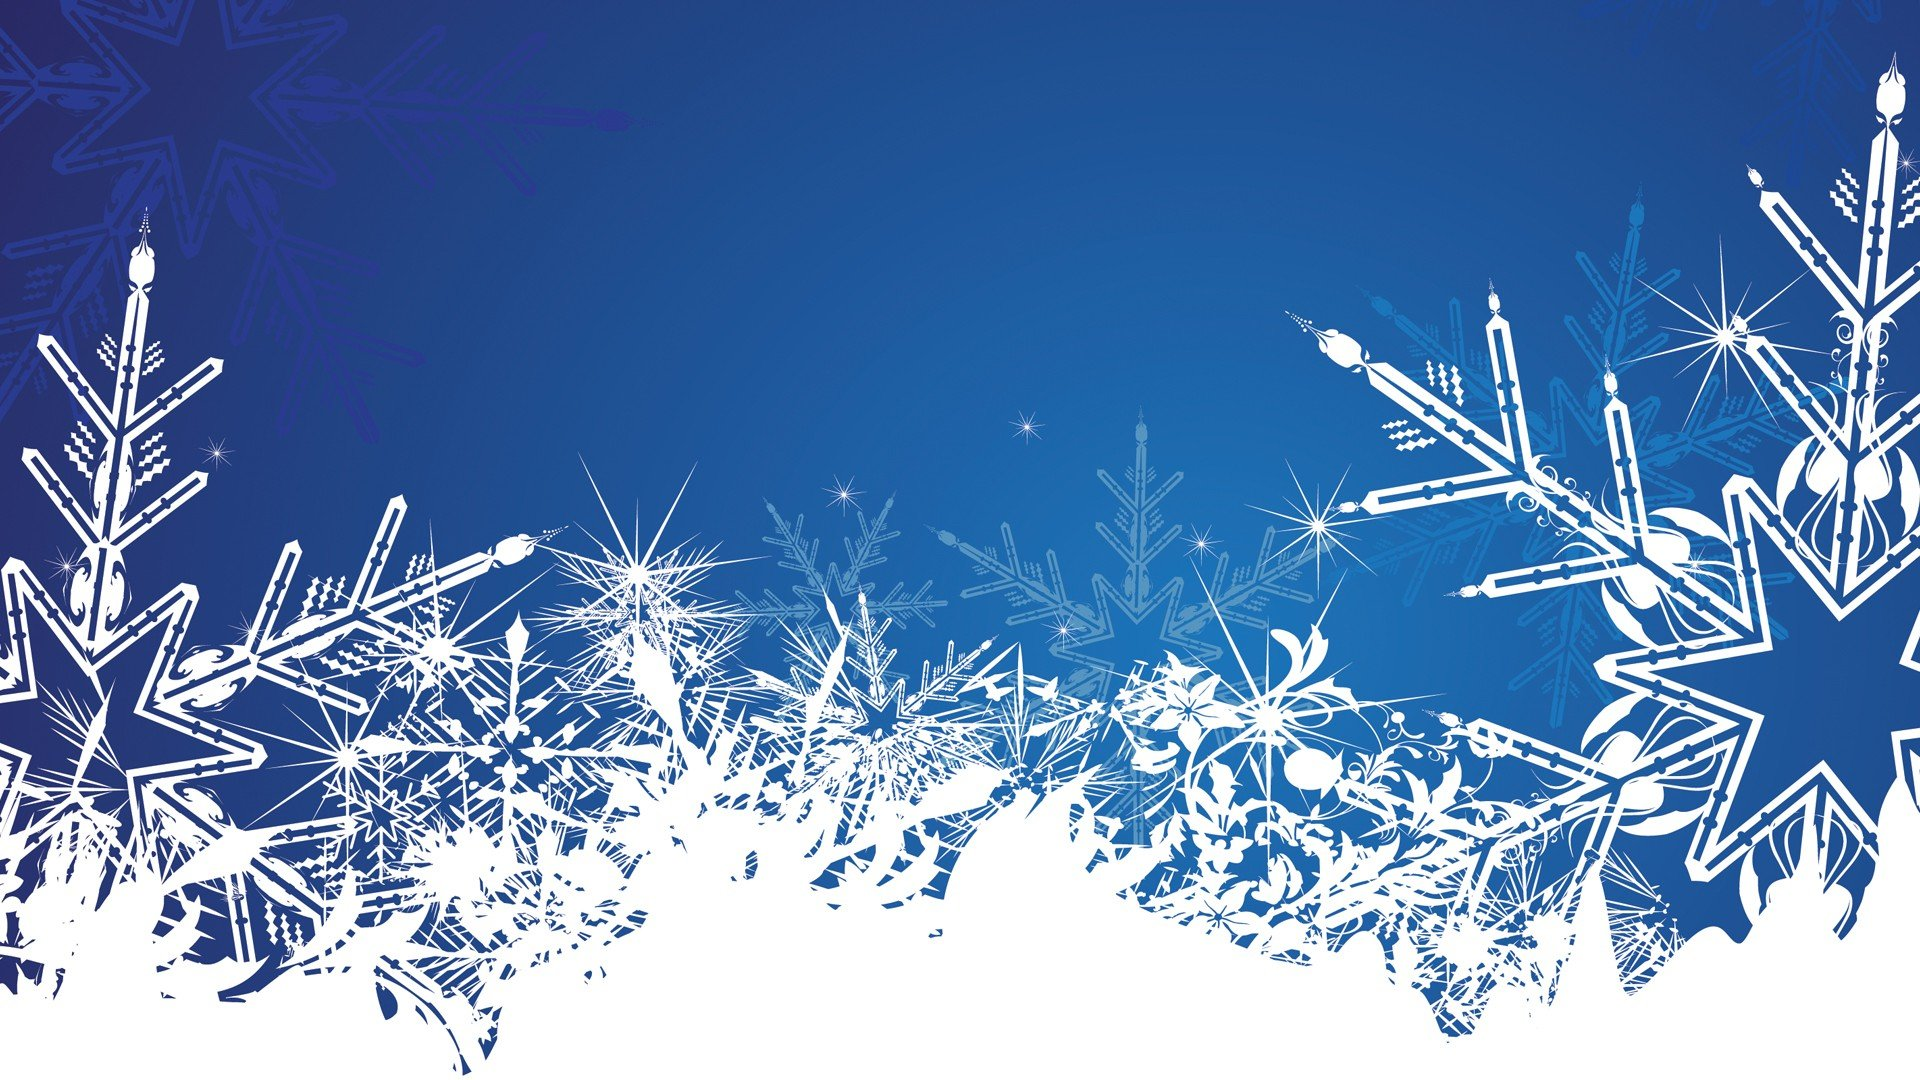 1920x1080 Winter Vectors Illustrations Snowflakes Blue Background Vector Art